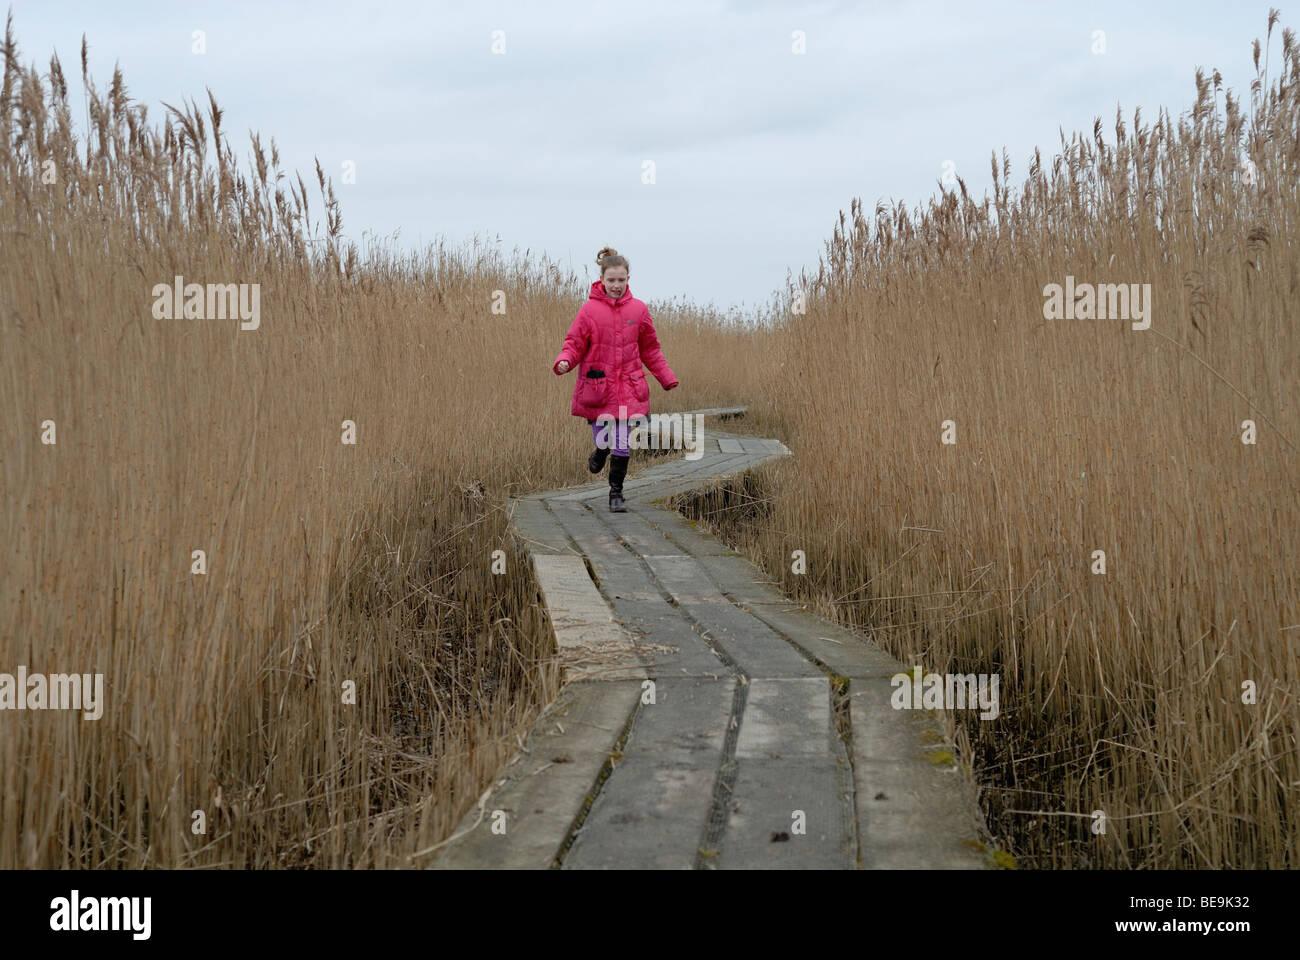 Meisje rennend over knuppelpad naar de Kiekkaaste; Girl running over wooden path to birdwatching tower Stock Photo